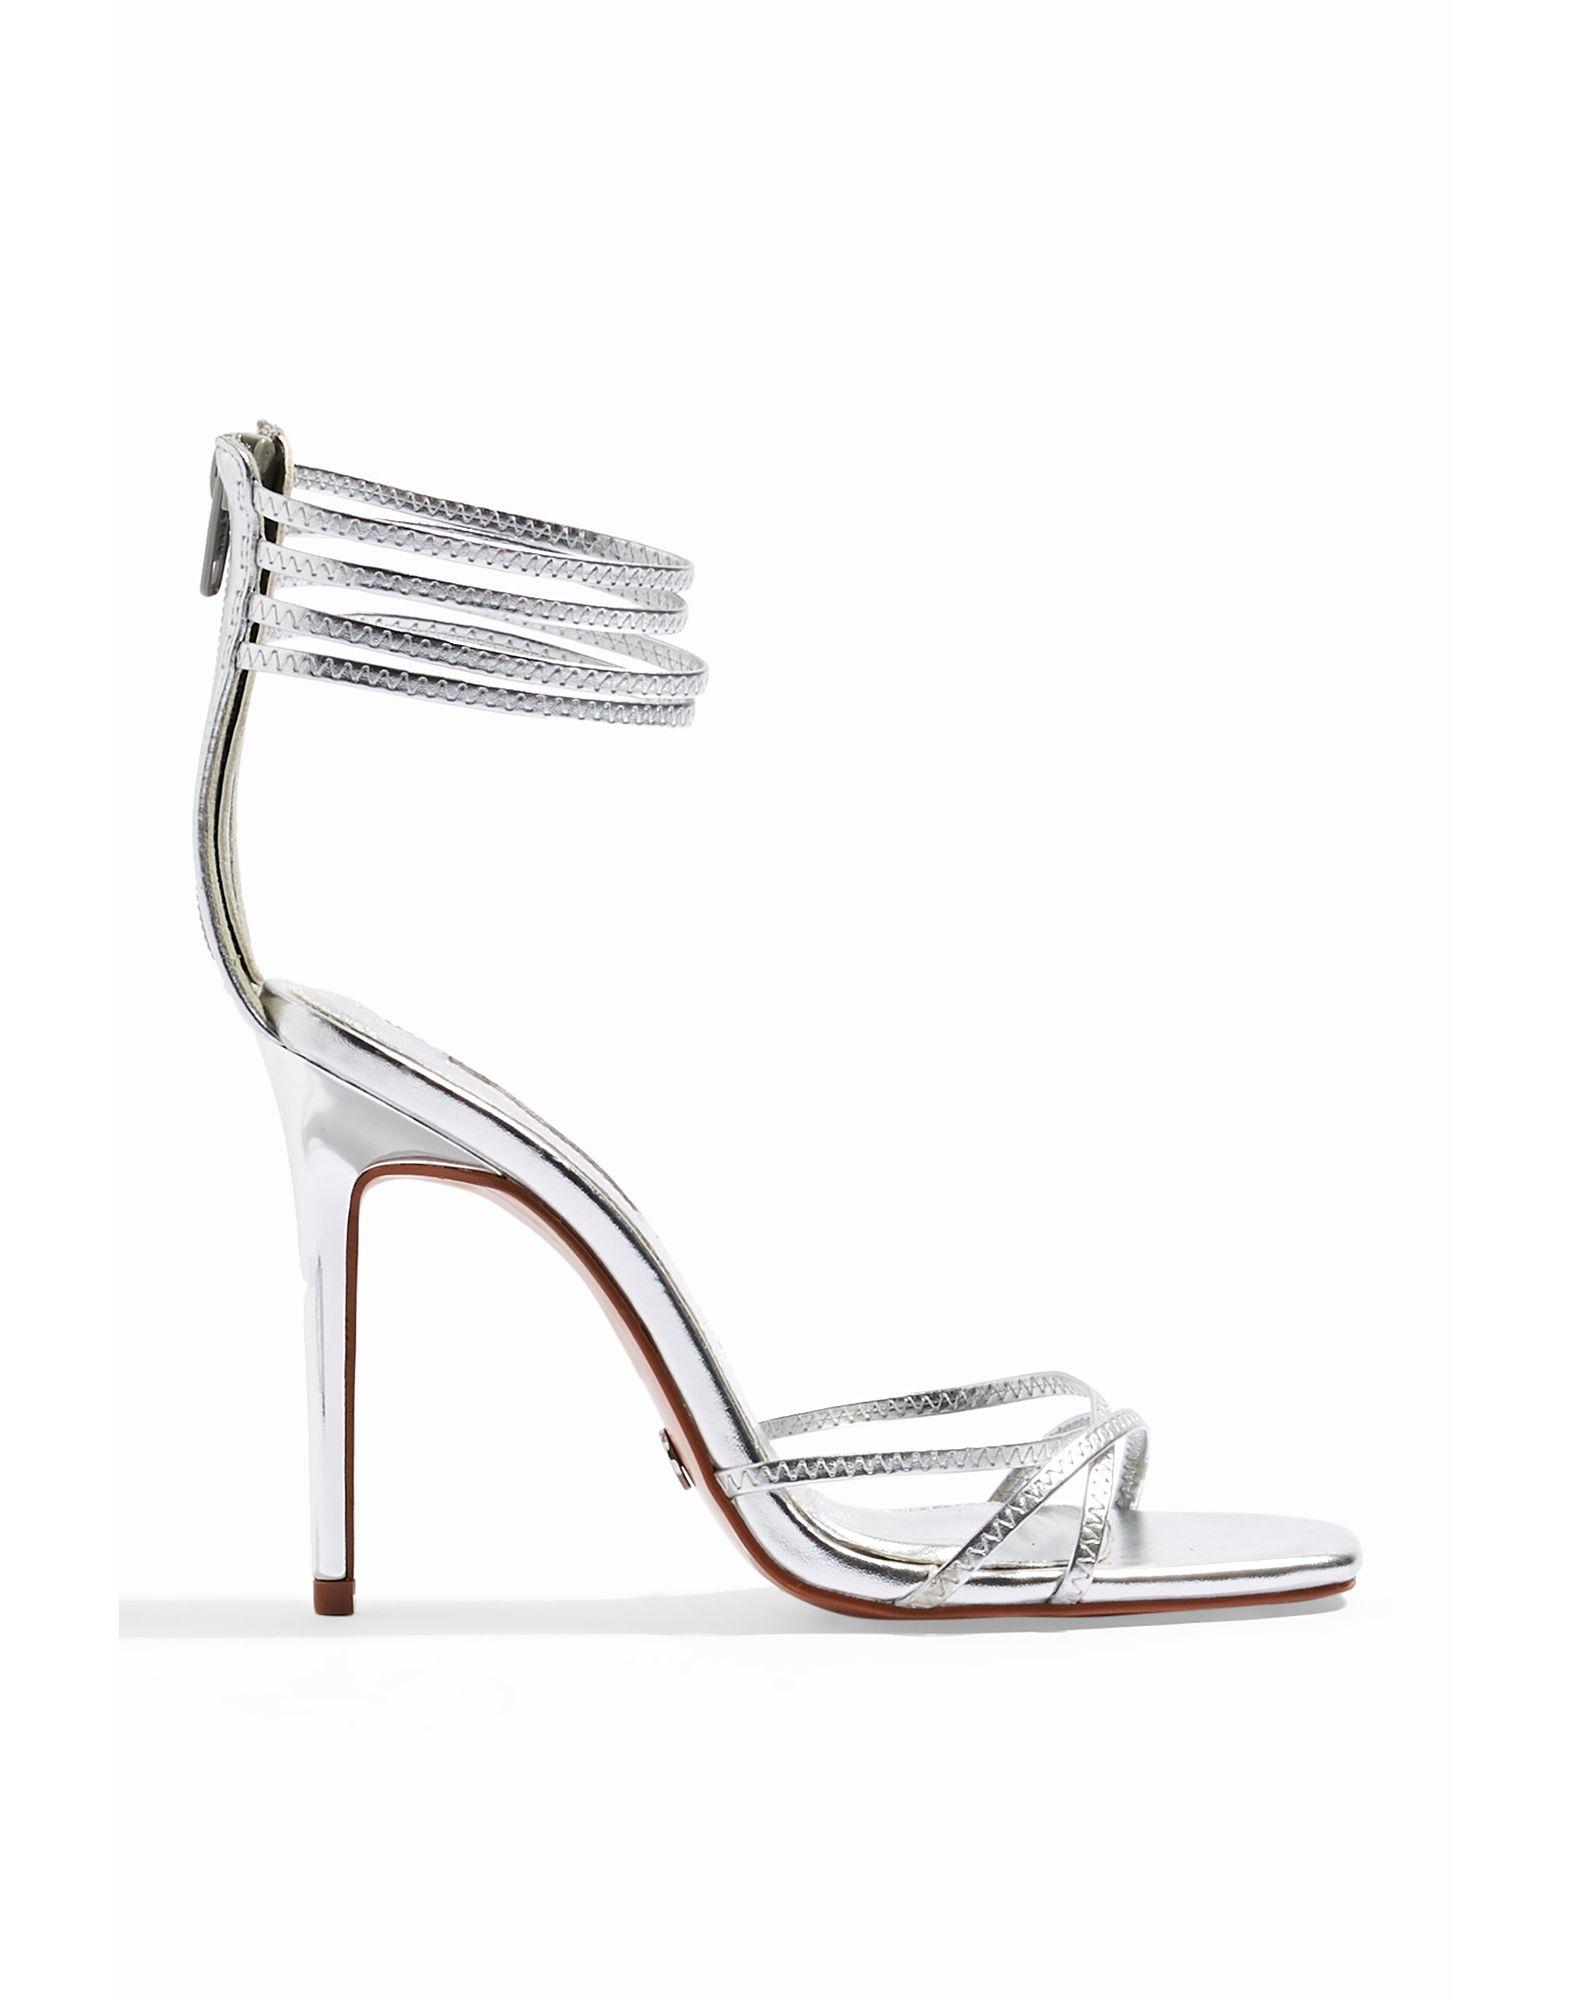 Sandales Topshop Rich Heeled Sandals - Femme - Sandales Topshop   - 11668165AE